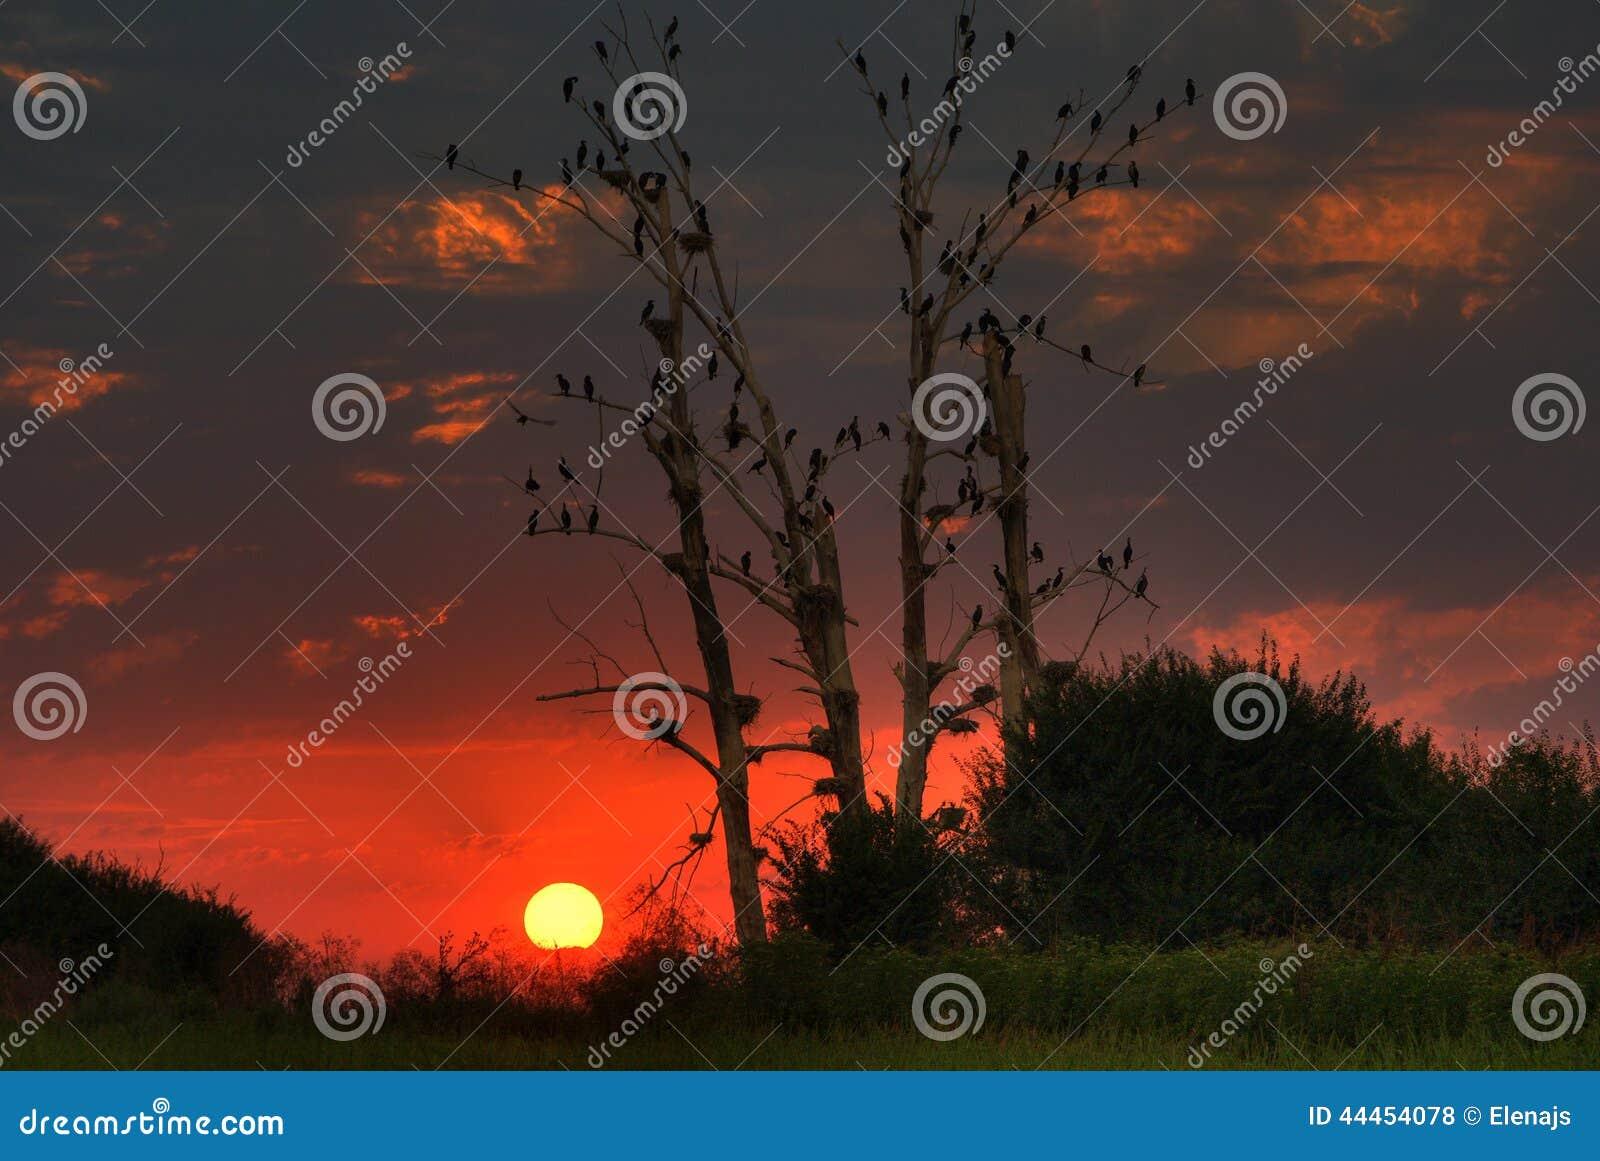 Beautiful sunset with sleeping birds